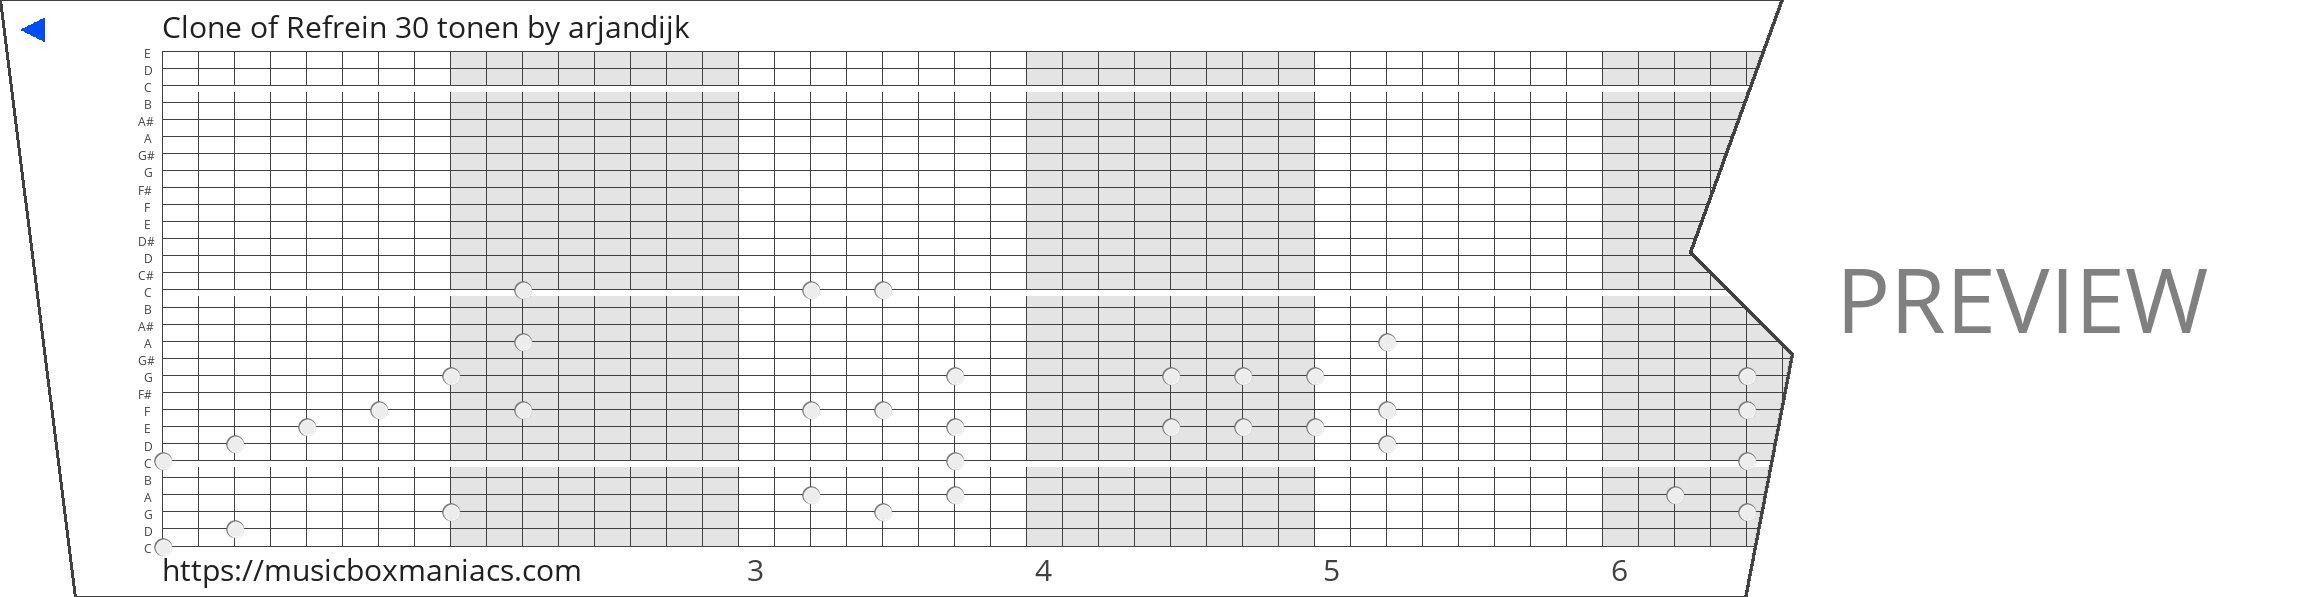 Clone of Refrein 30 tonen 30 note music box paper strip